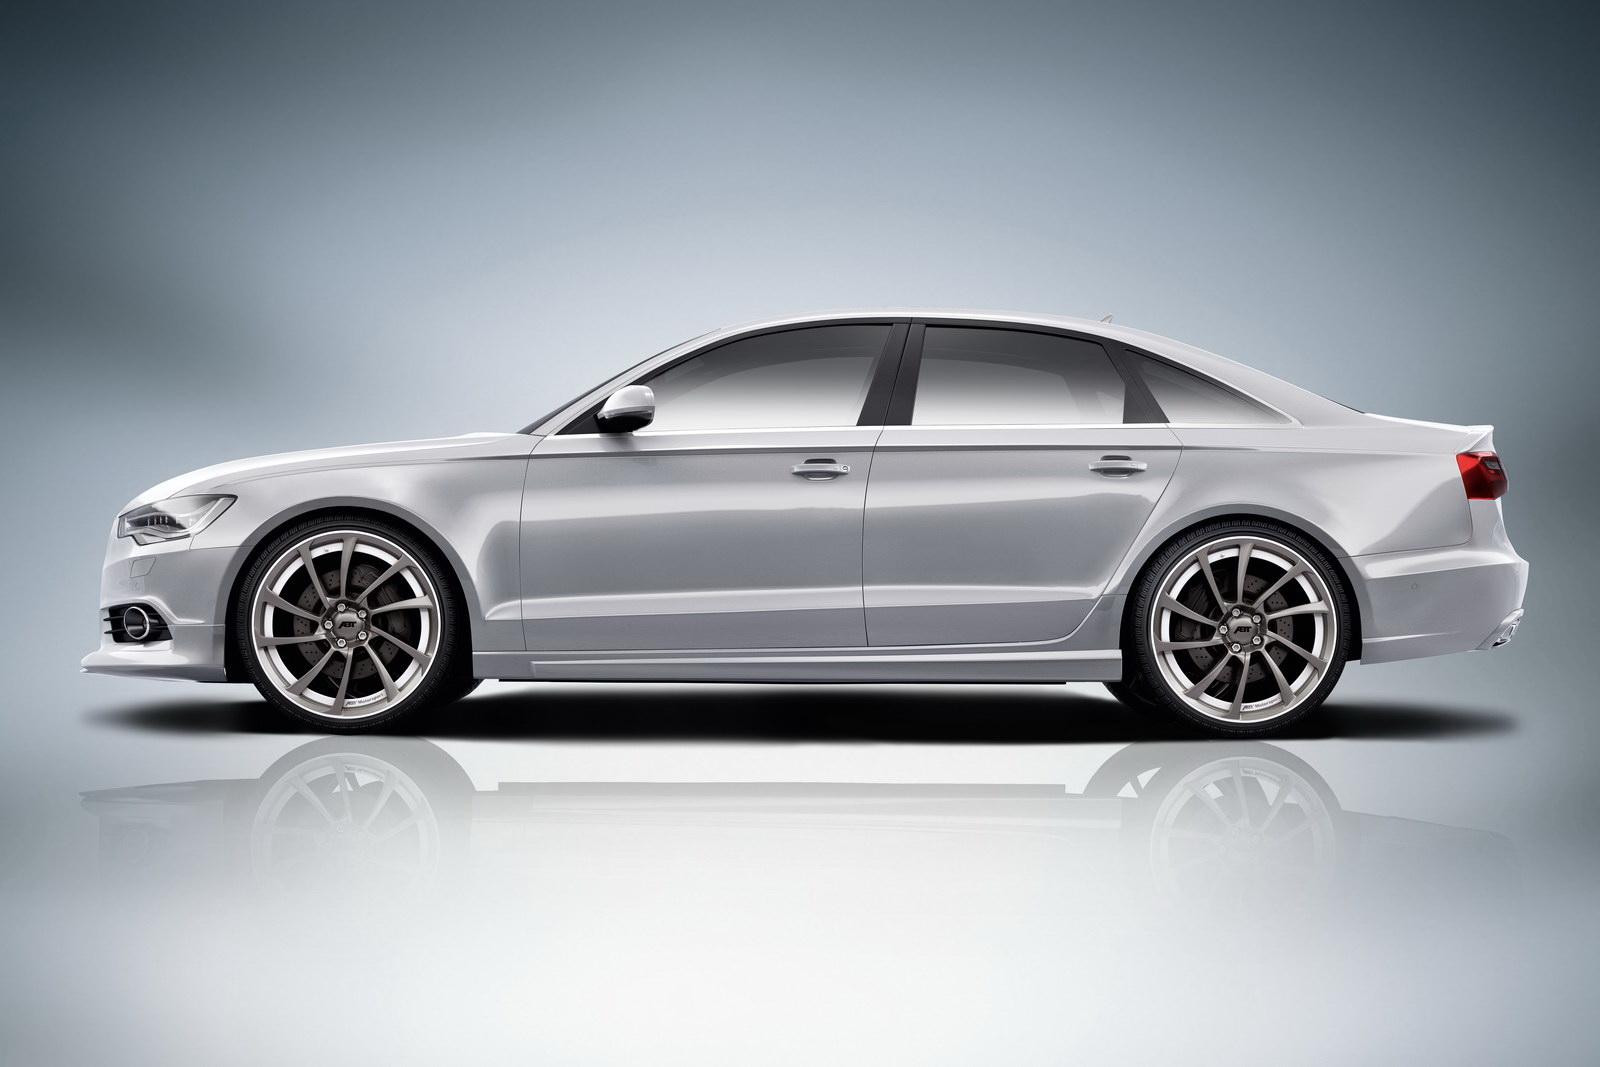 In stock Alert: ABT Sportsline Audi A6 C7 aero kit